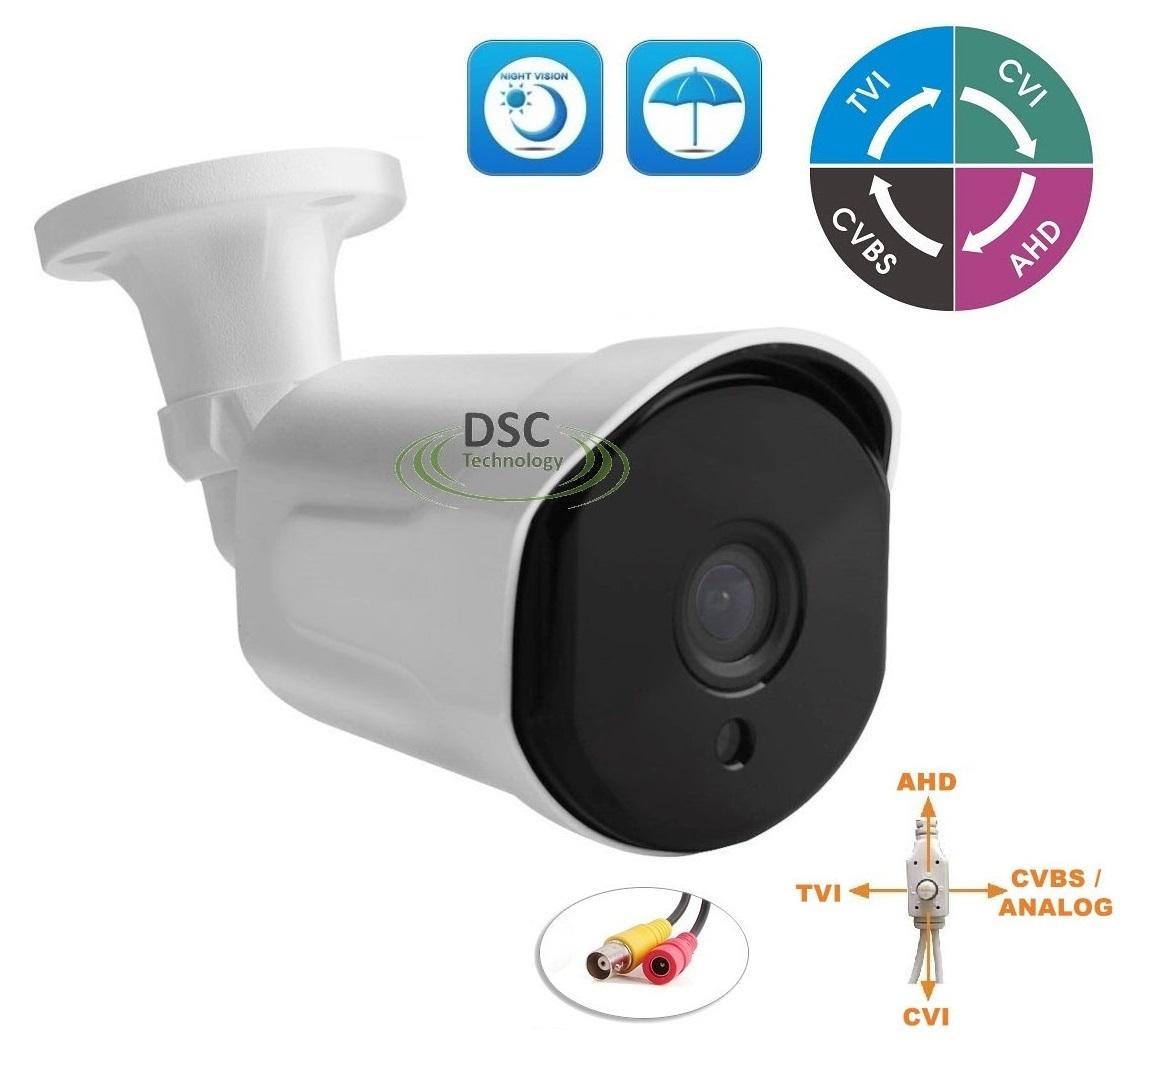 HD-CVI 1080p HD 2.4MP Fisheye 360 Camera IR Infrared Night Vision Outdoor Indoor